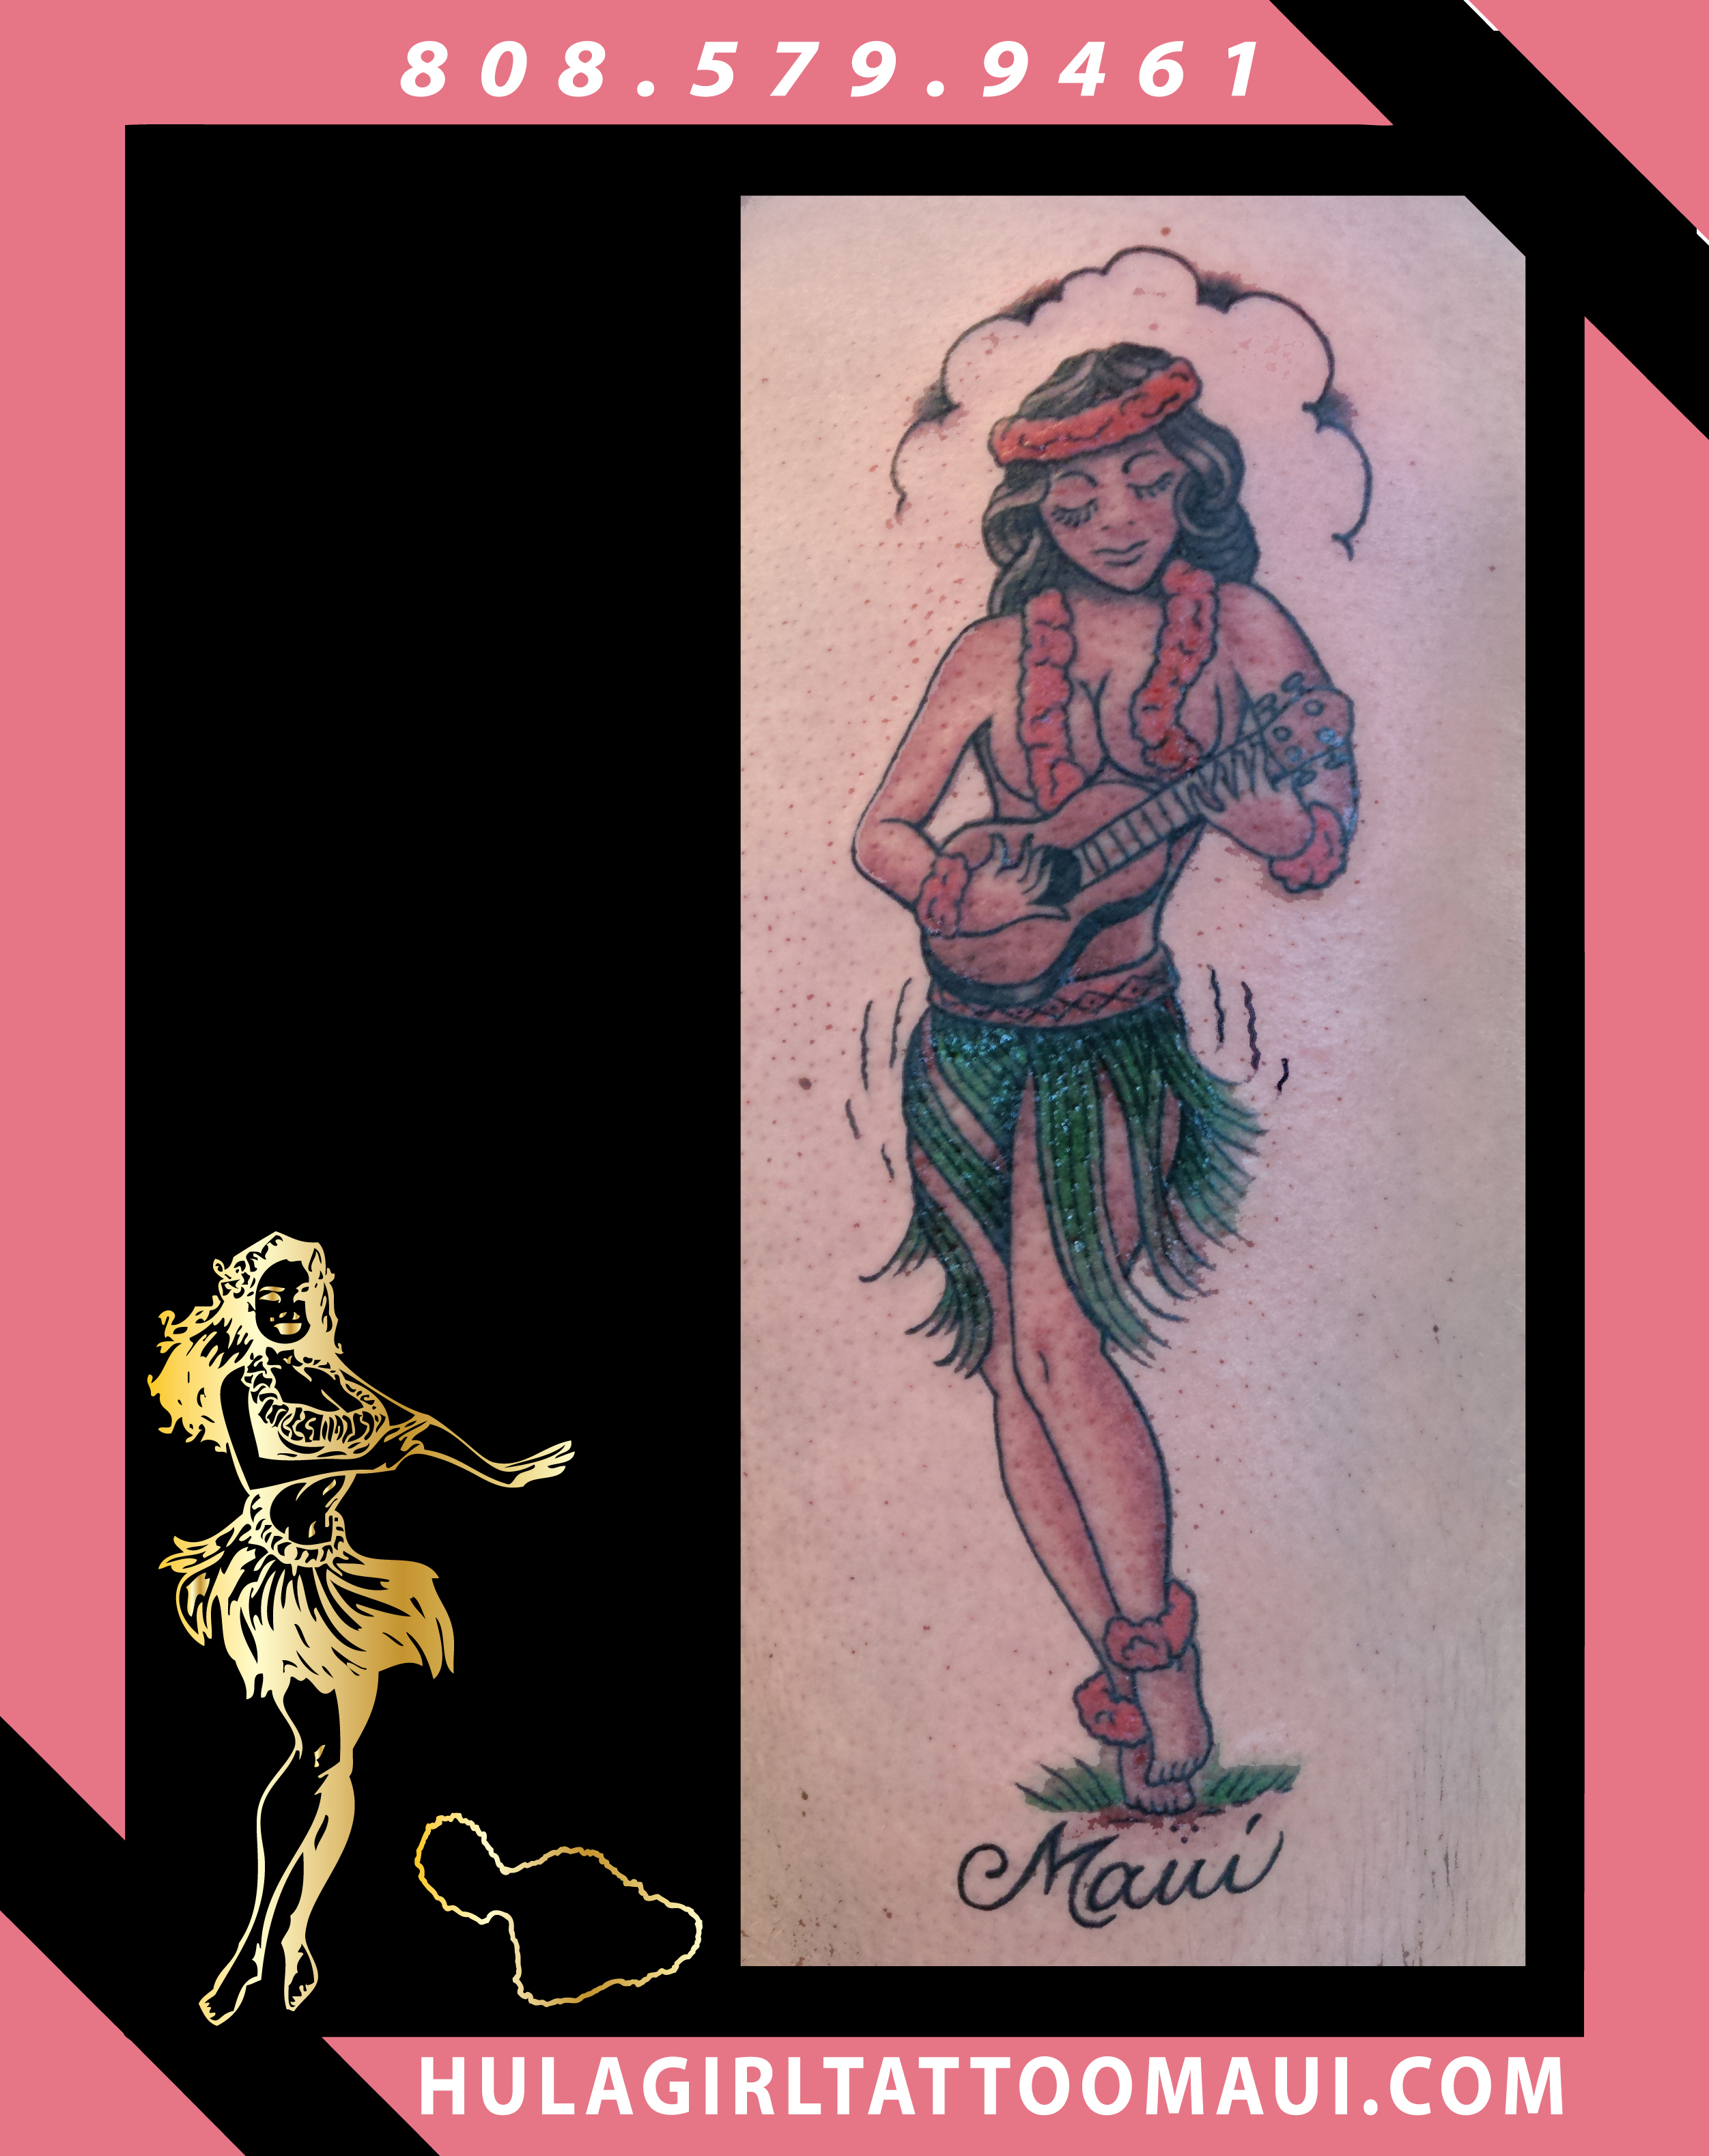 Hula Girl Tattoo Tattooing Paia Hawaii